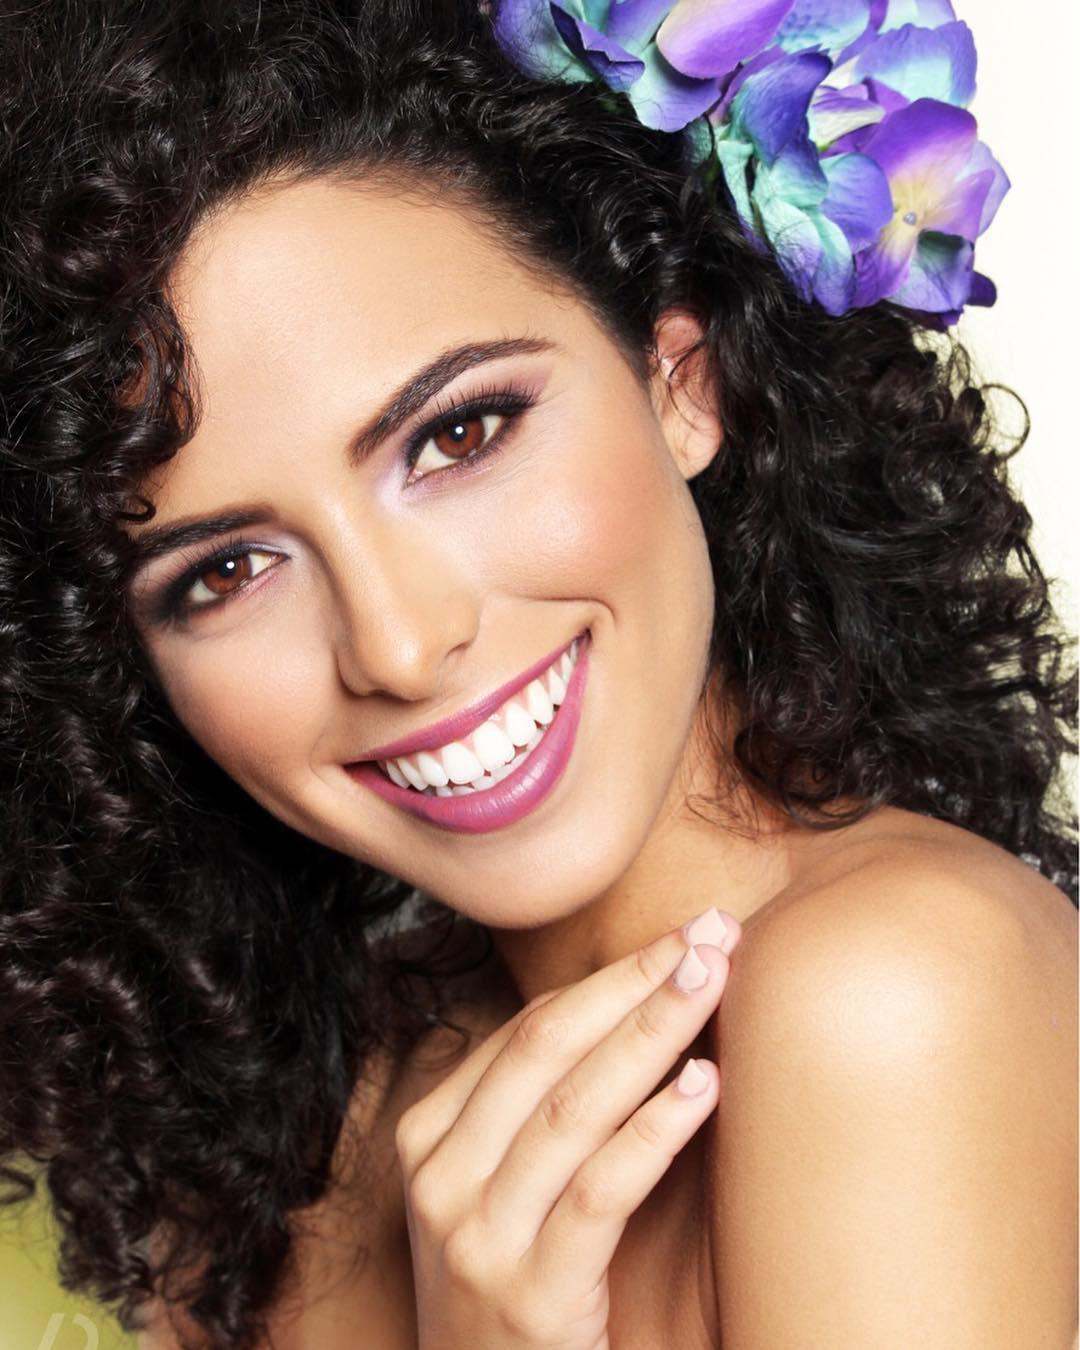 yuanilie alvarado, segunda finalista de reyna hispanoamericana 2019. 35617310